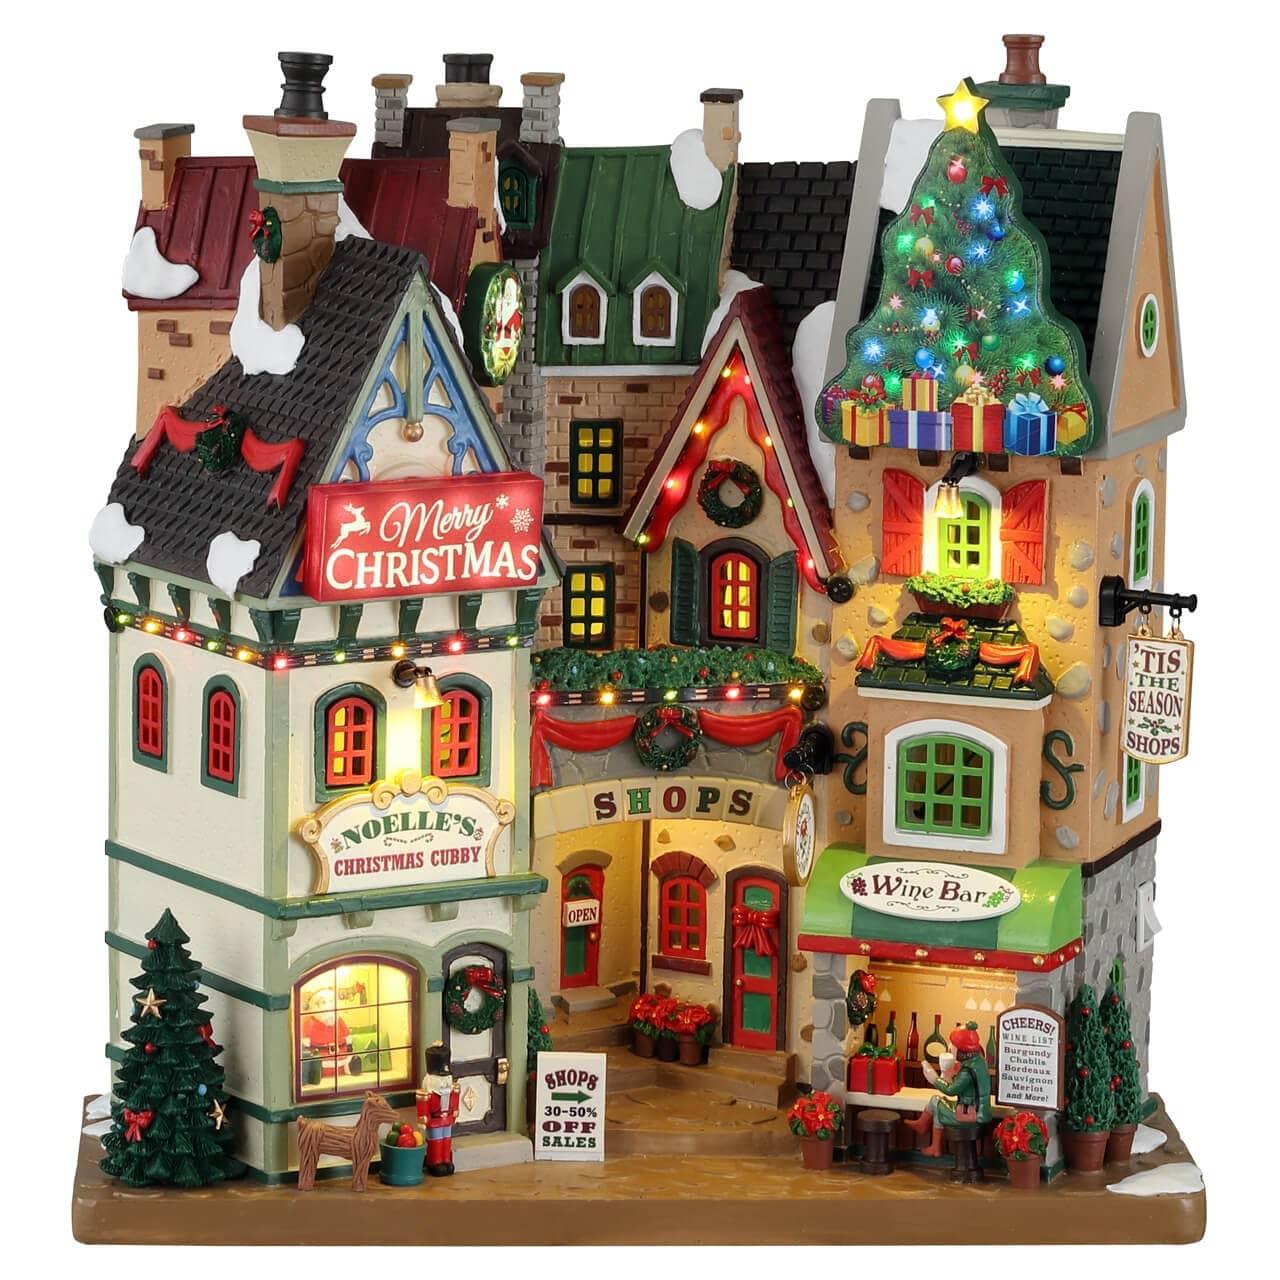 tis_the_season_shops